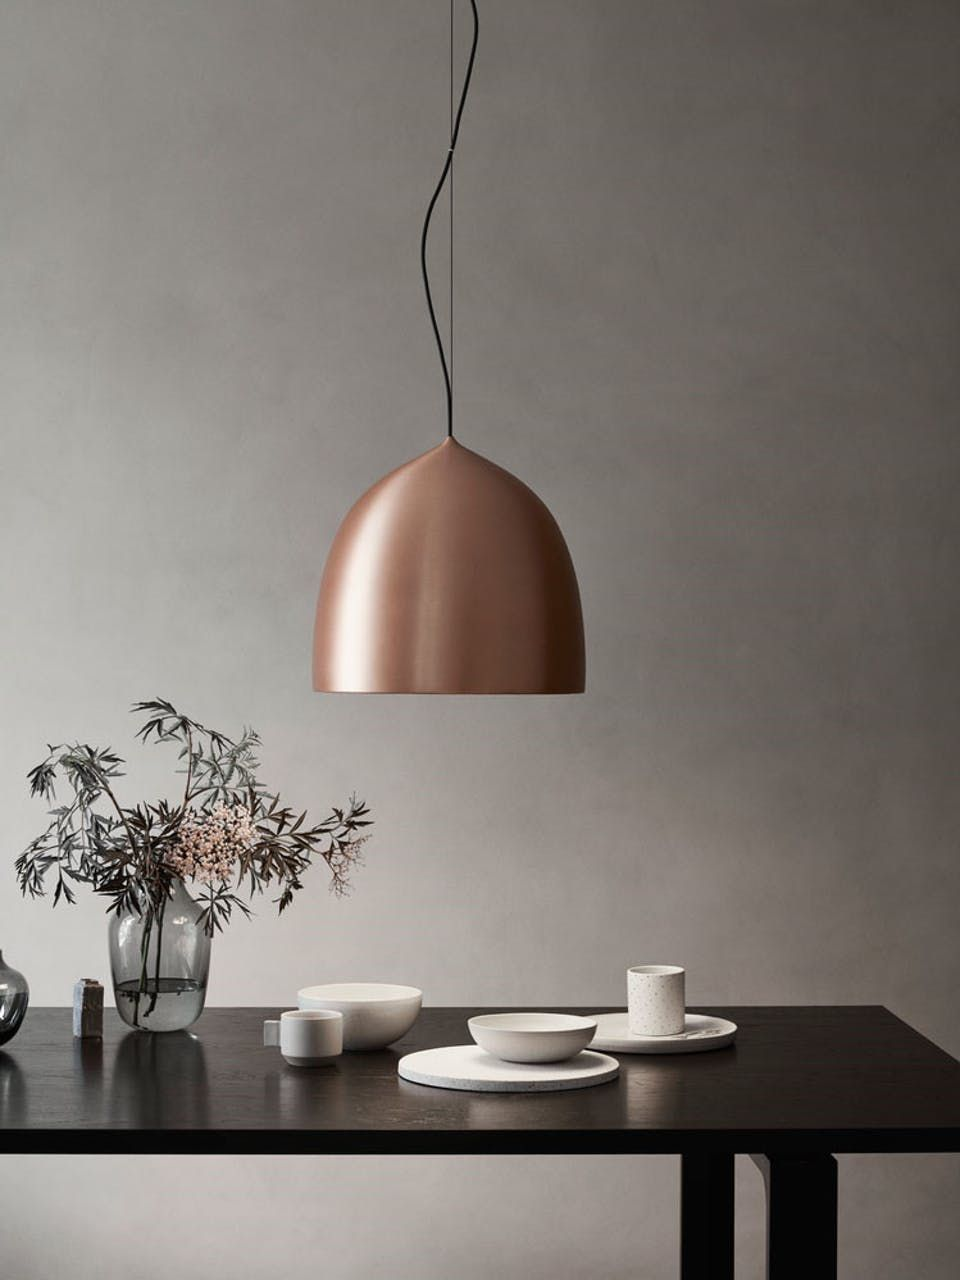 Elegant Lamp In Copper From Danish Designer Gamfratesi Taklamper Taklampe Spisestue Lamper